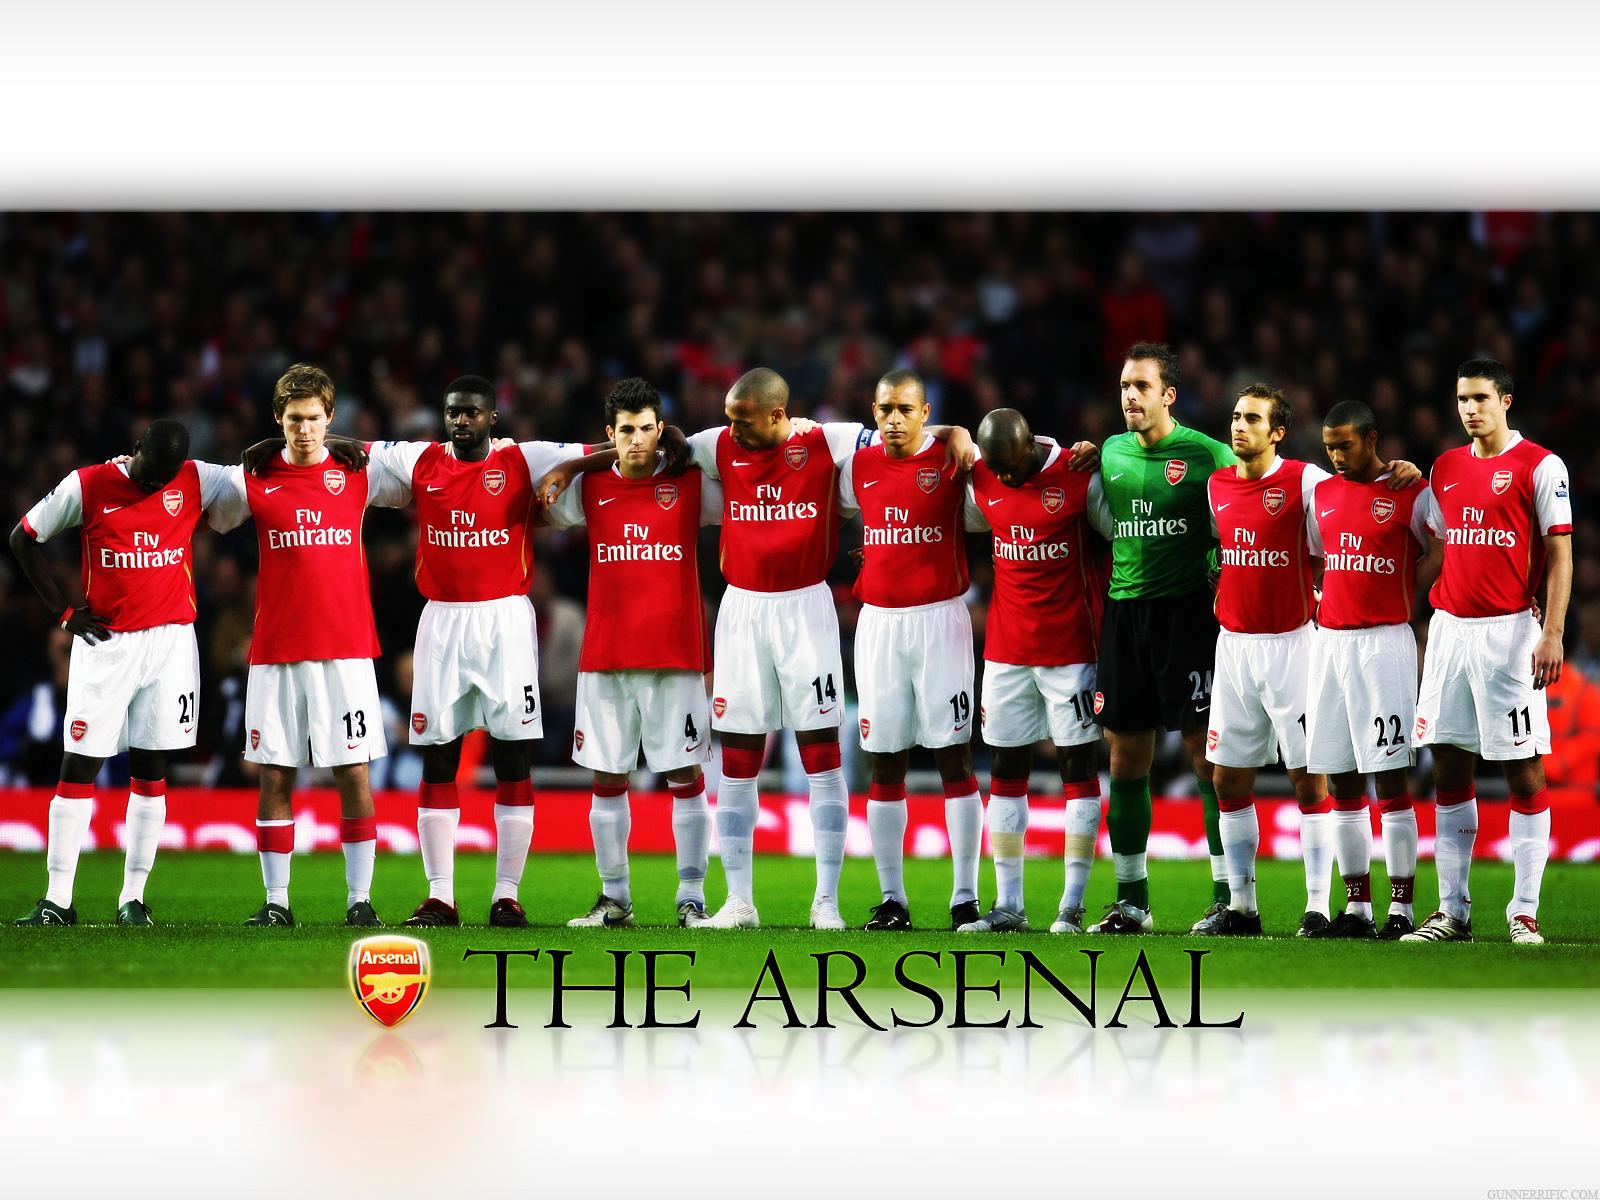 arsenal - Arsenal Wallpaper (131440) - Fanpop